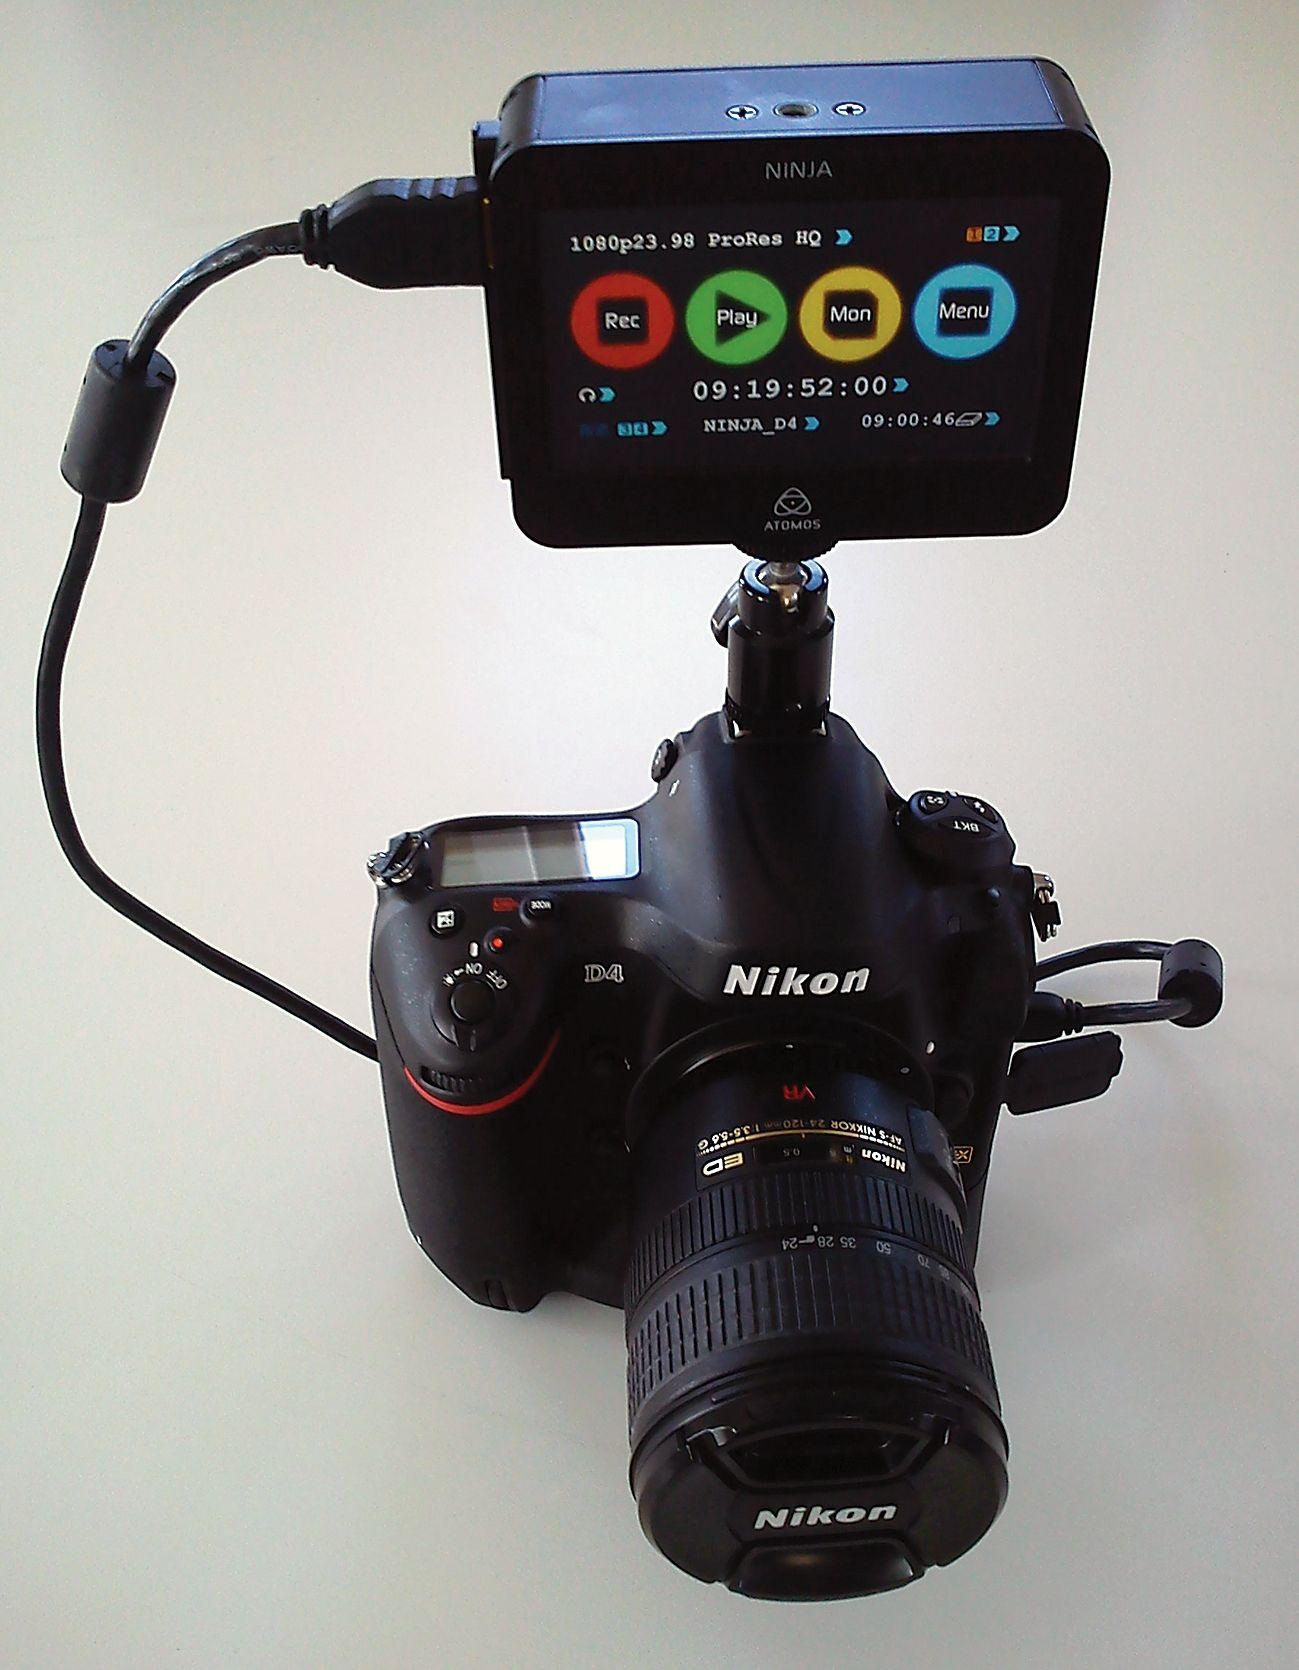 Atomos - The Ninja - HDMI ProRes HDD or SSD Recorder